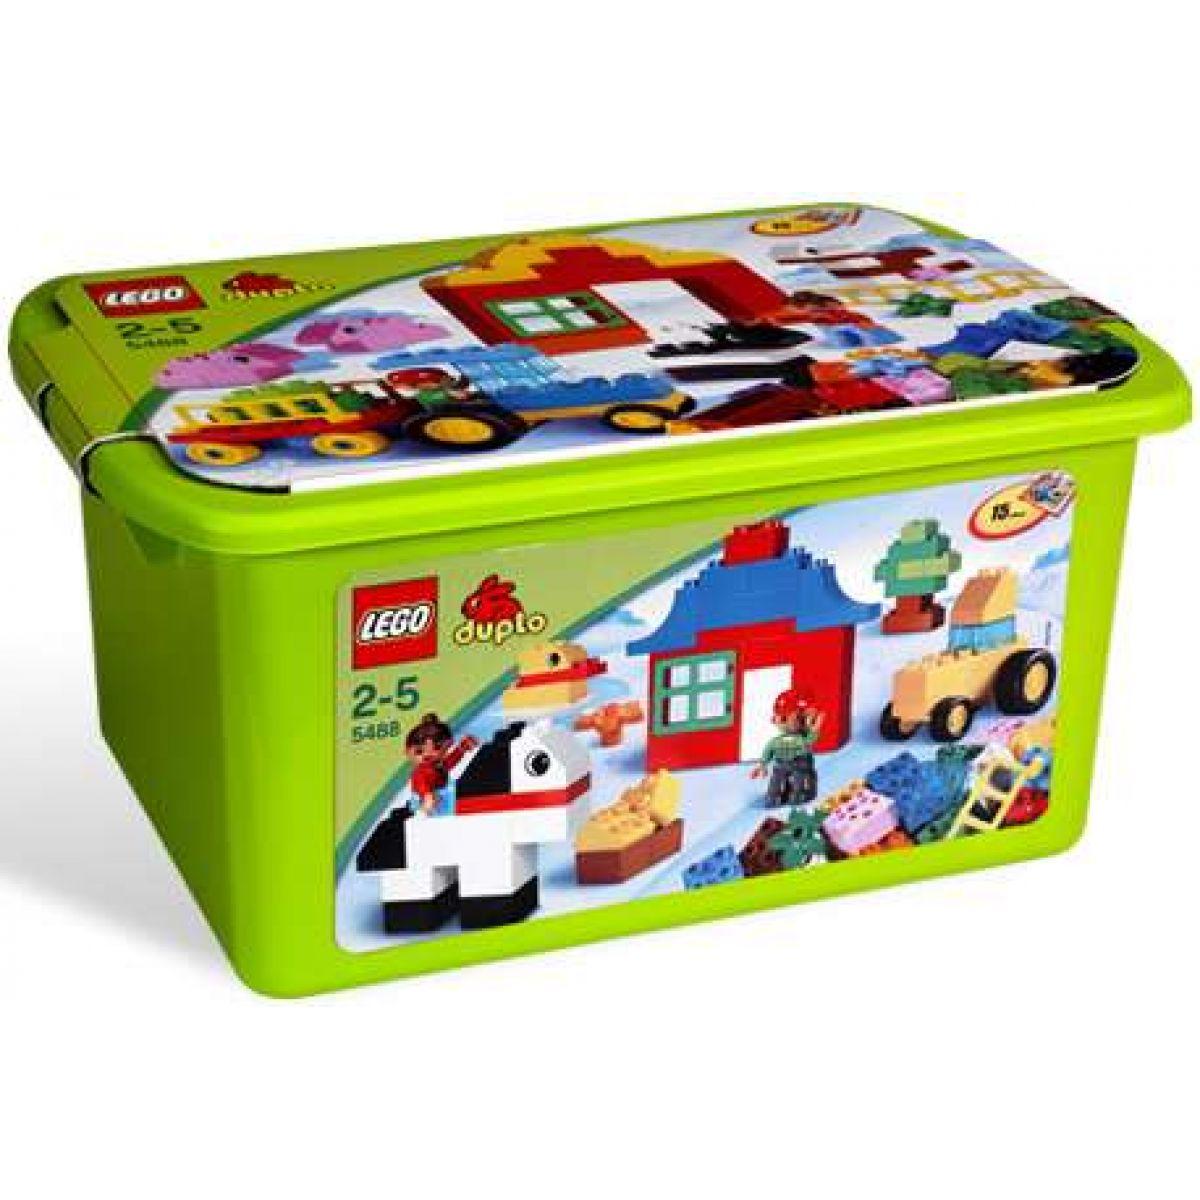 LEGO DUPLO 5488 Box Exklusive